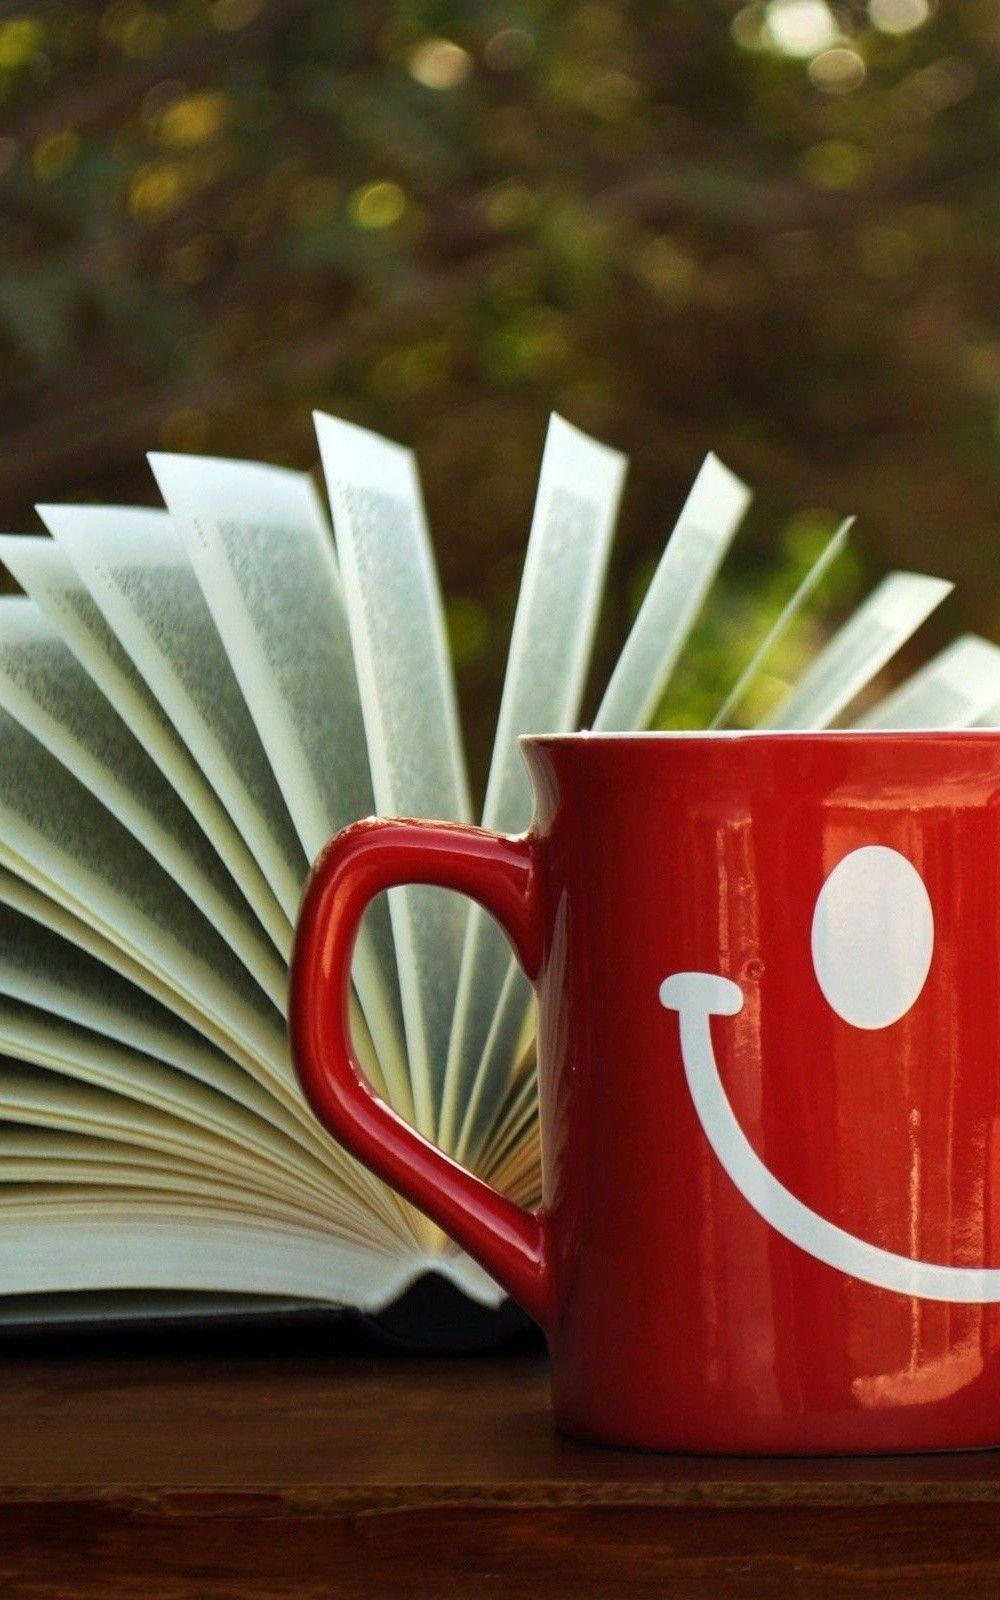 Open Book Red Smile Mug Hd Wallpaper